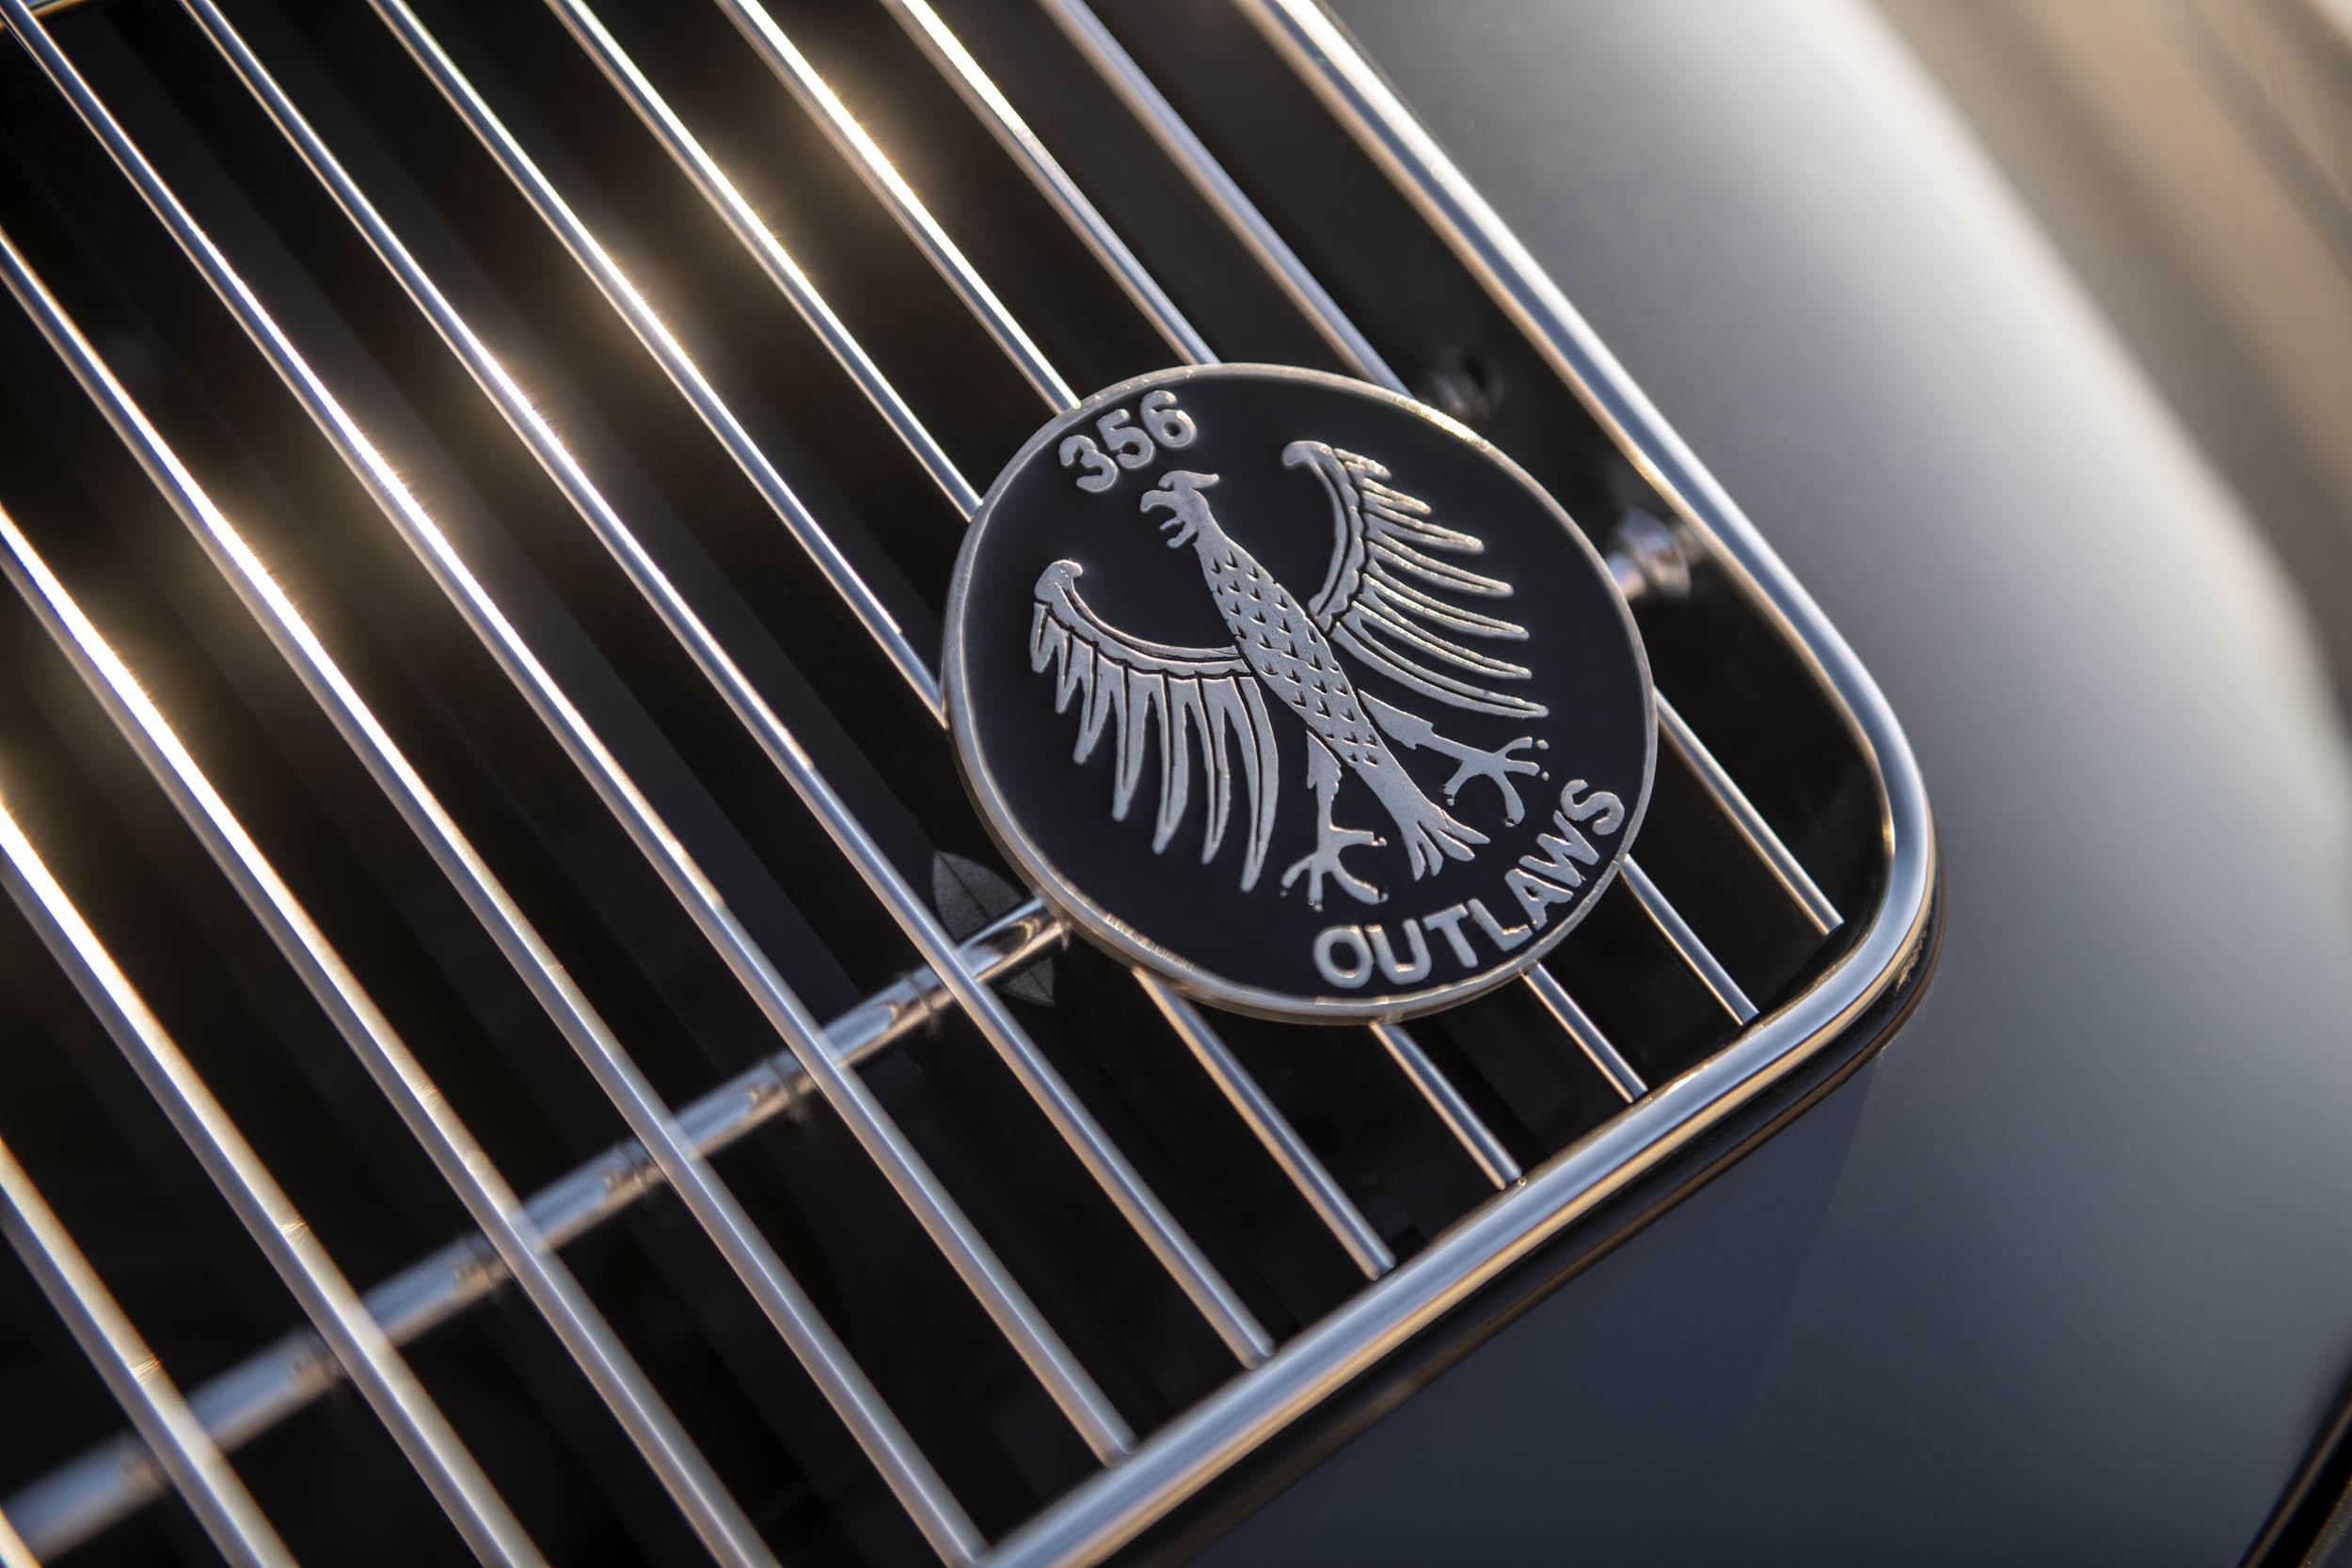 Emory Porsche 356 C4S Allrad badge